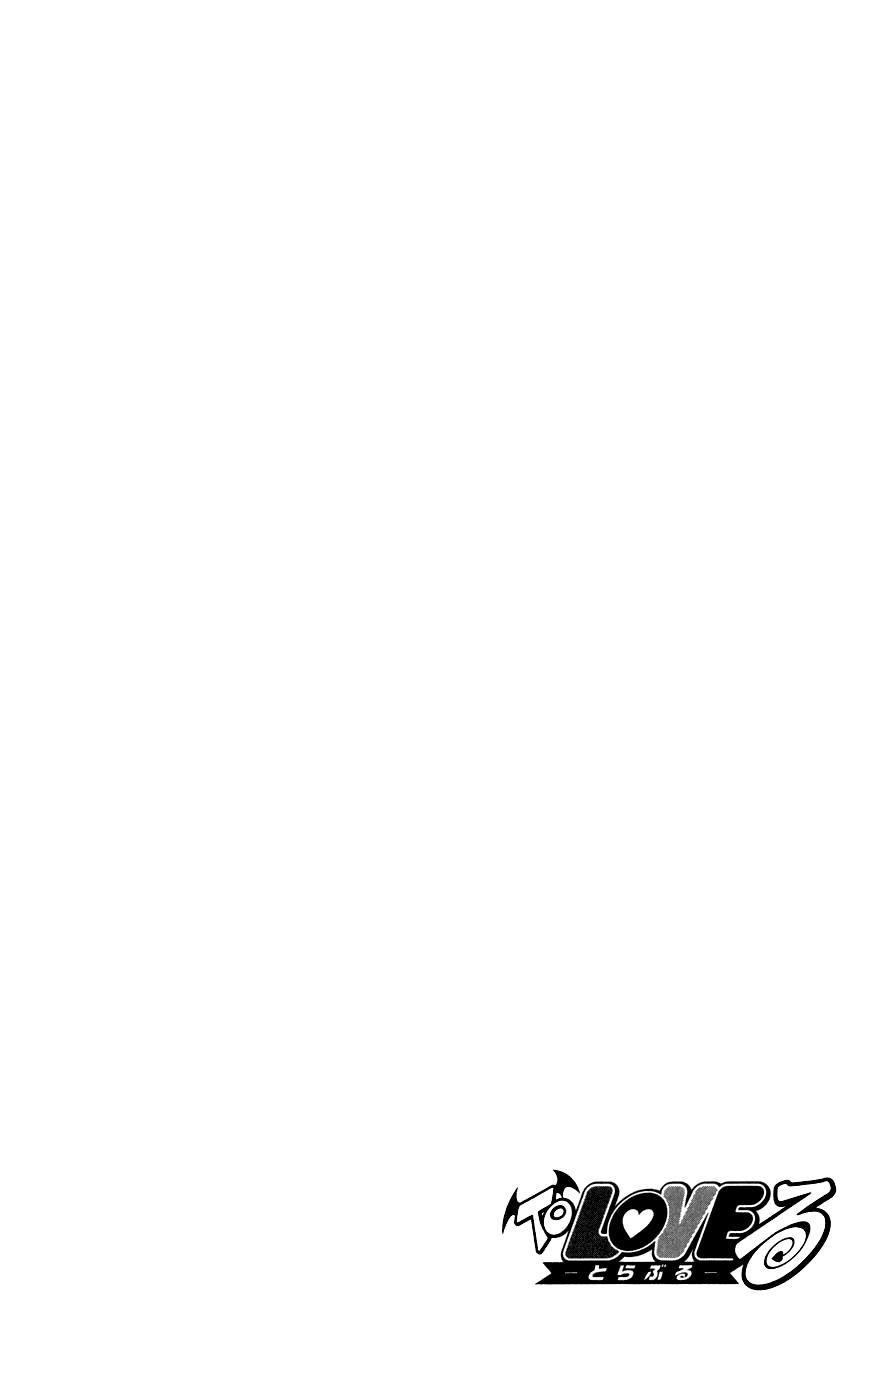 Манга Любовные неприятности / To Love-Ru  - Том 6 Глава 51 Страница 20